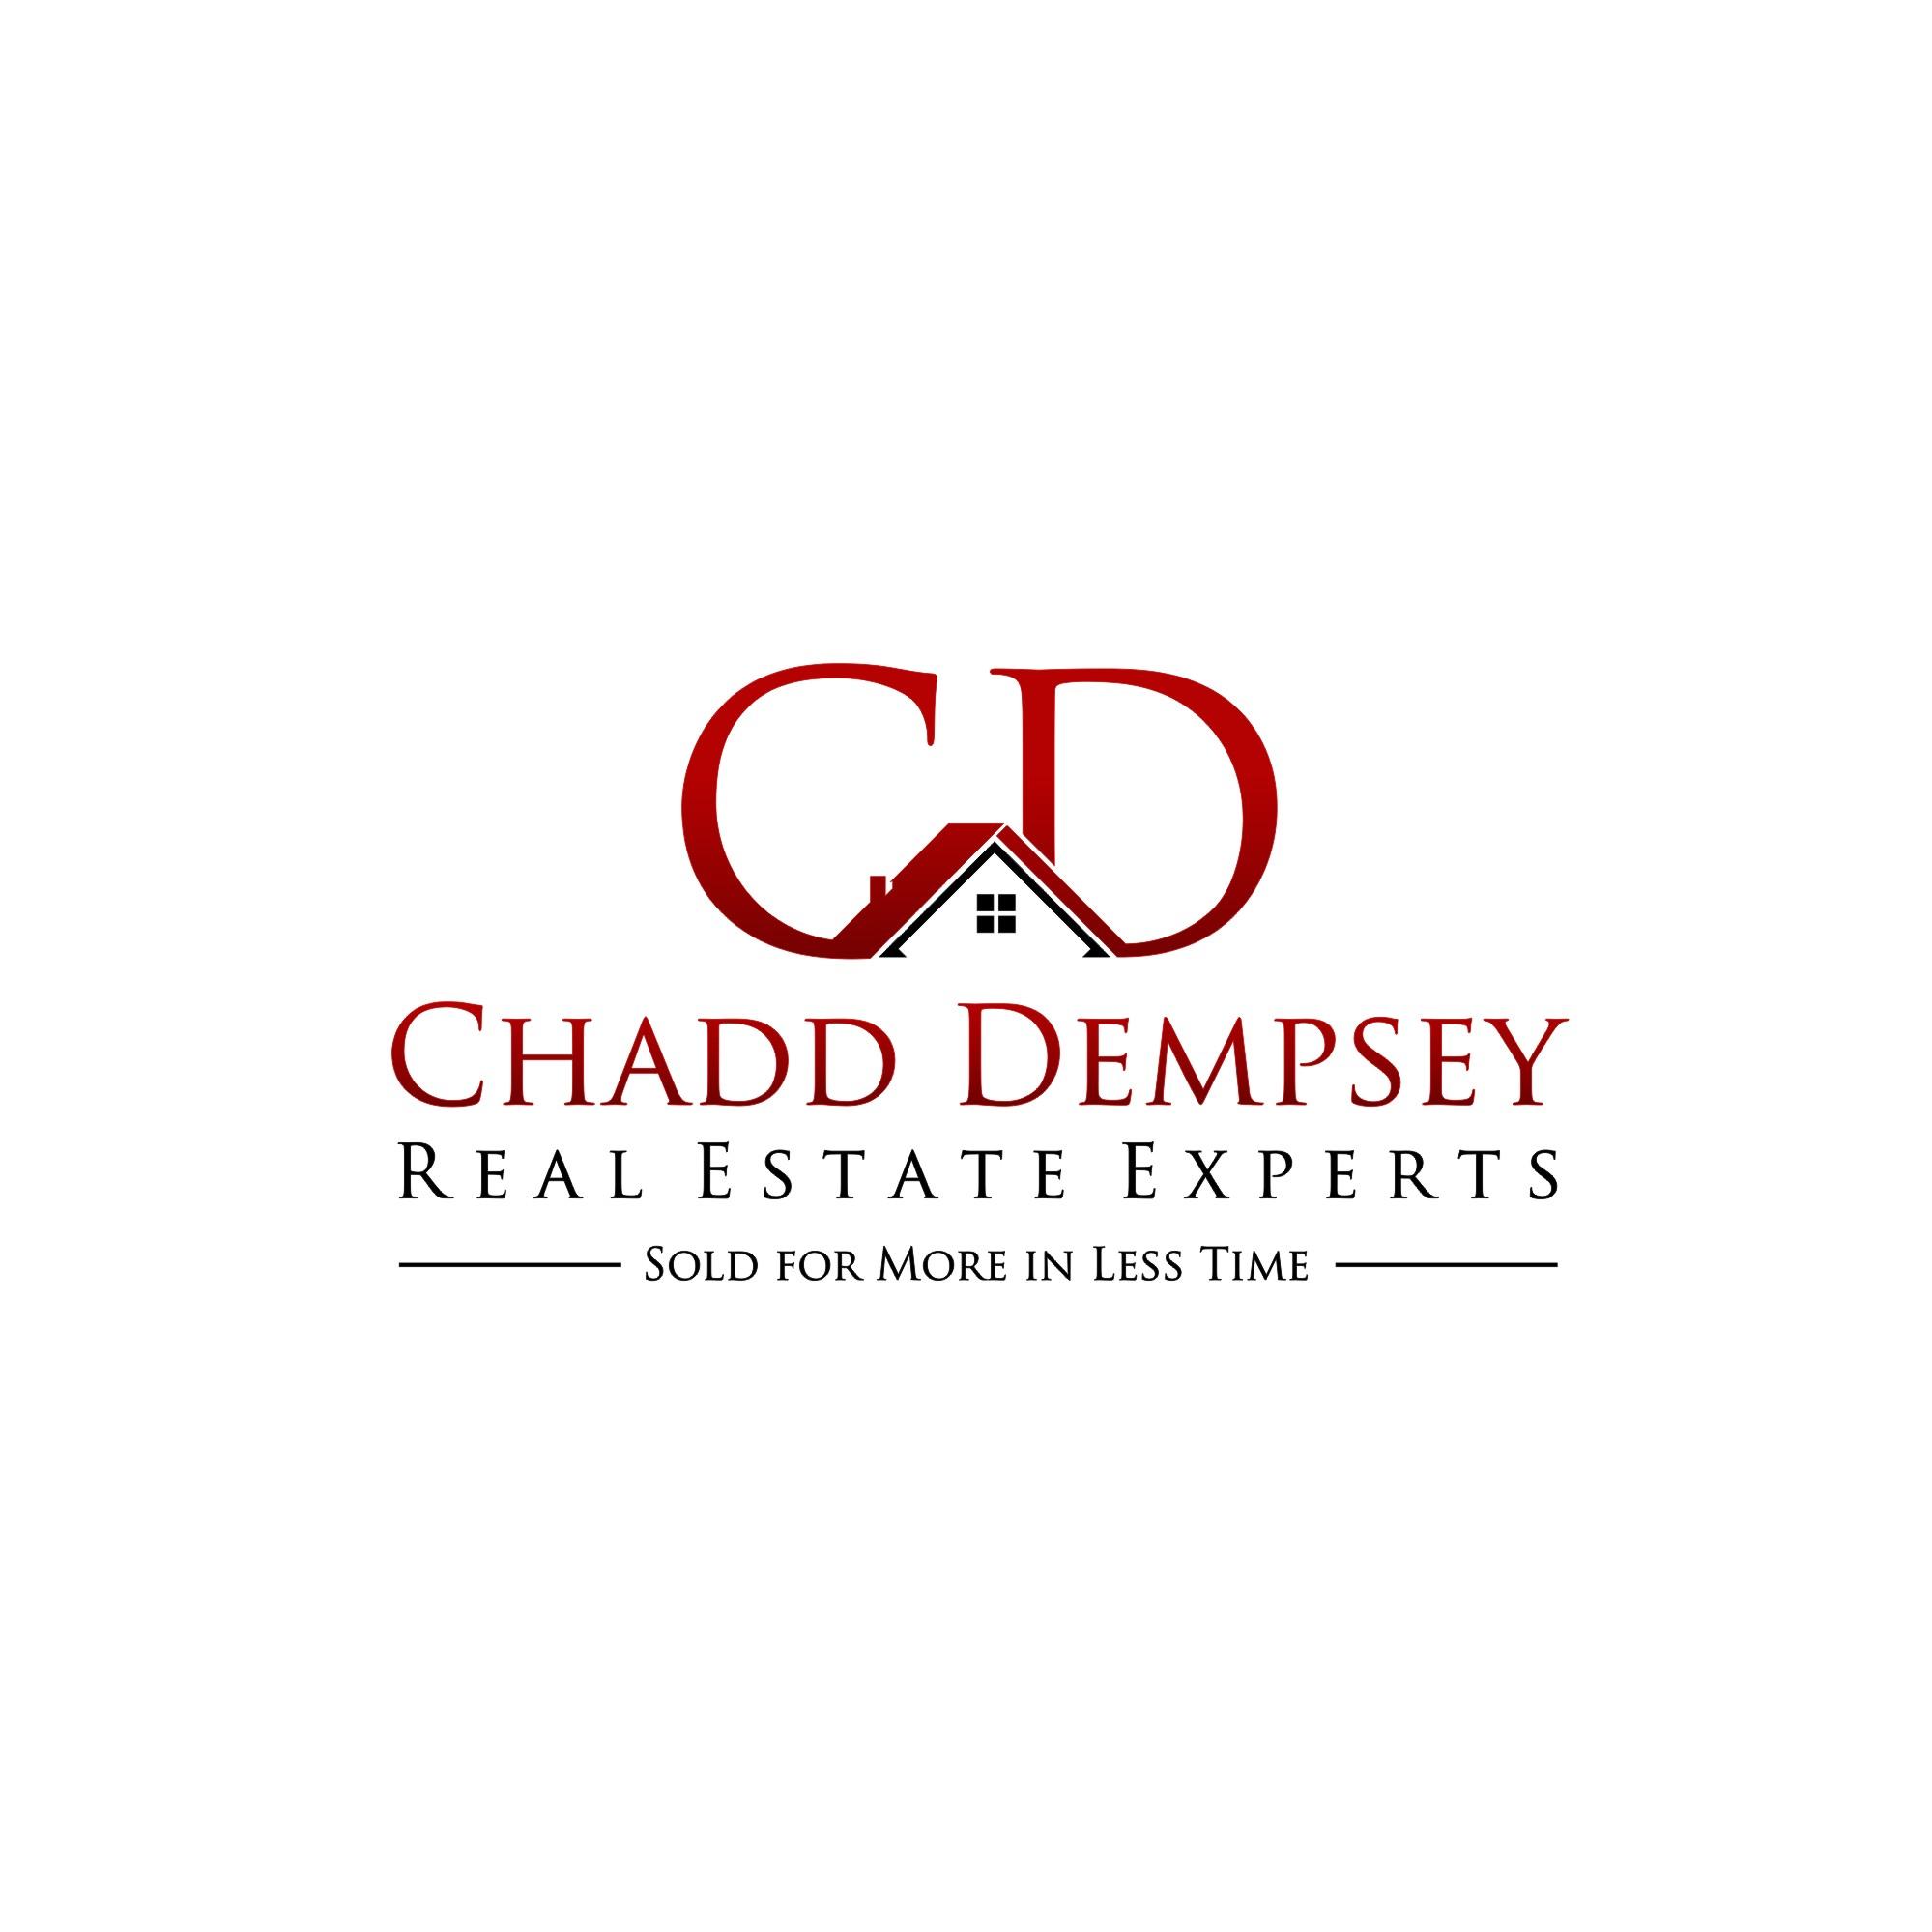 Chadd Dempsey Real Estate Experts - Keller Williams Realty Metropolitan  logo